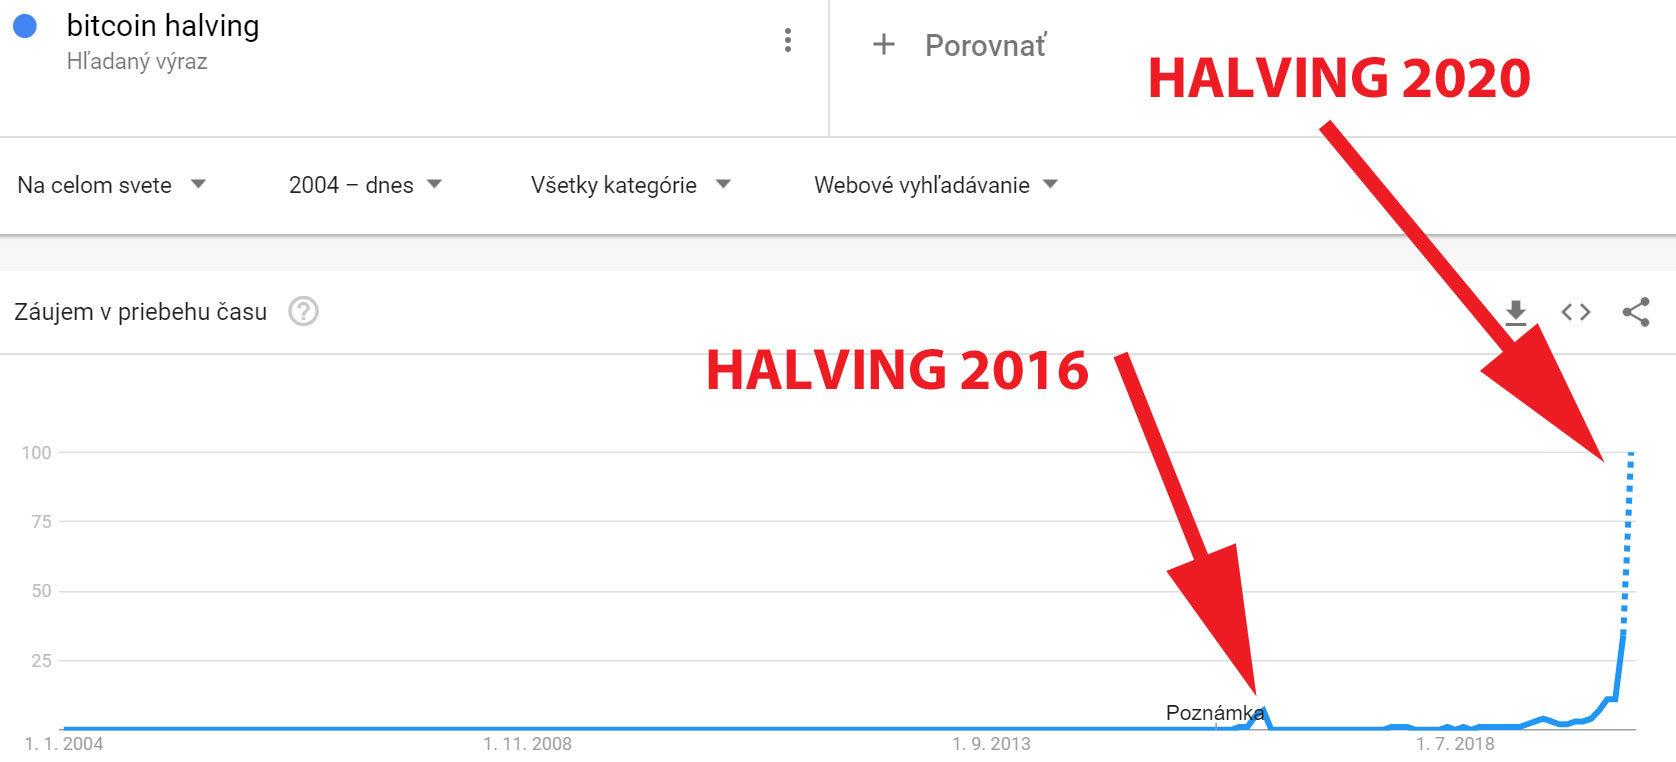 halving-2016-2020